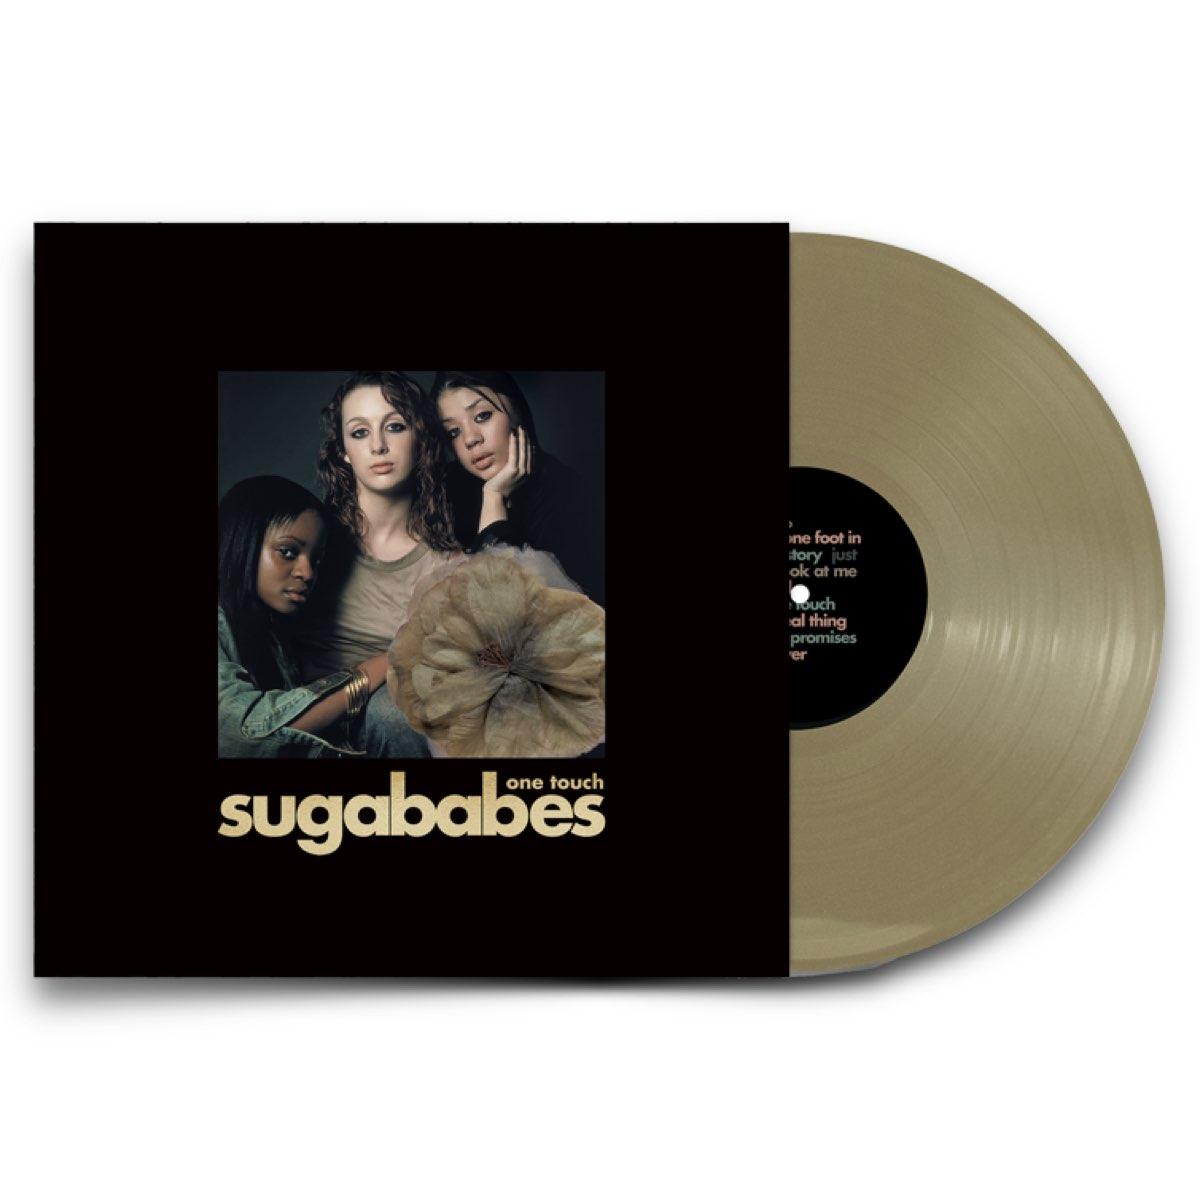 Sugababes - One Touch: Remastered Gold LP + Overload CD Single [Autografado e Numerado]